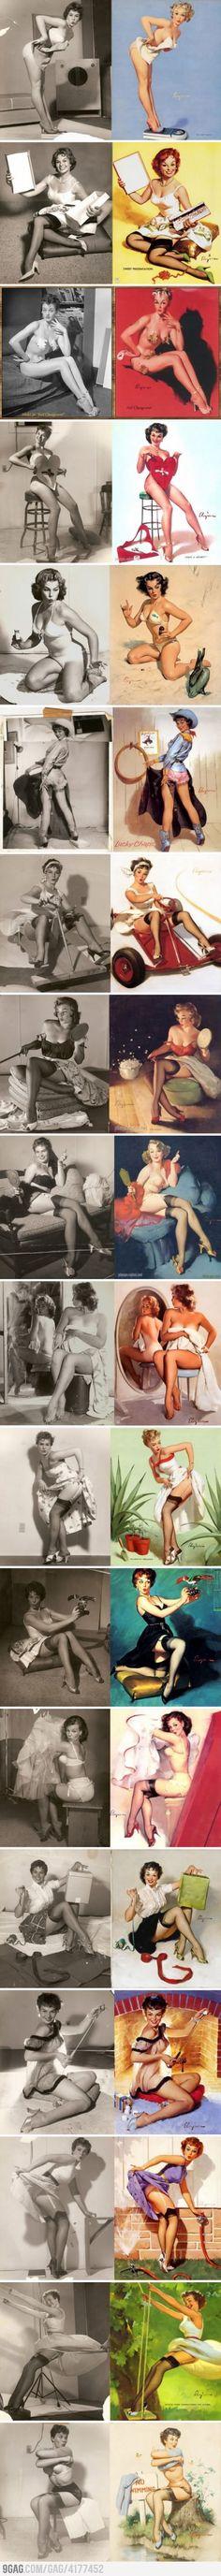 Real girls vs. Pin-up girls